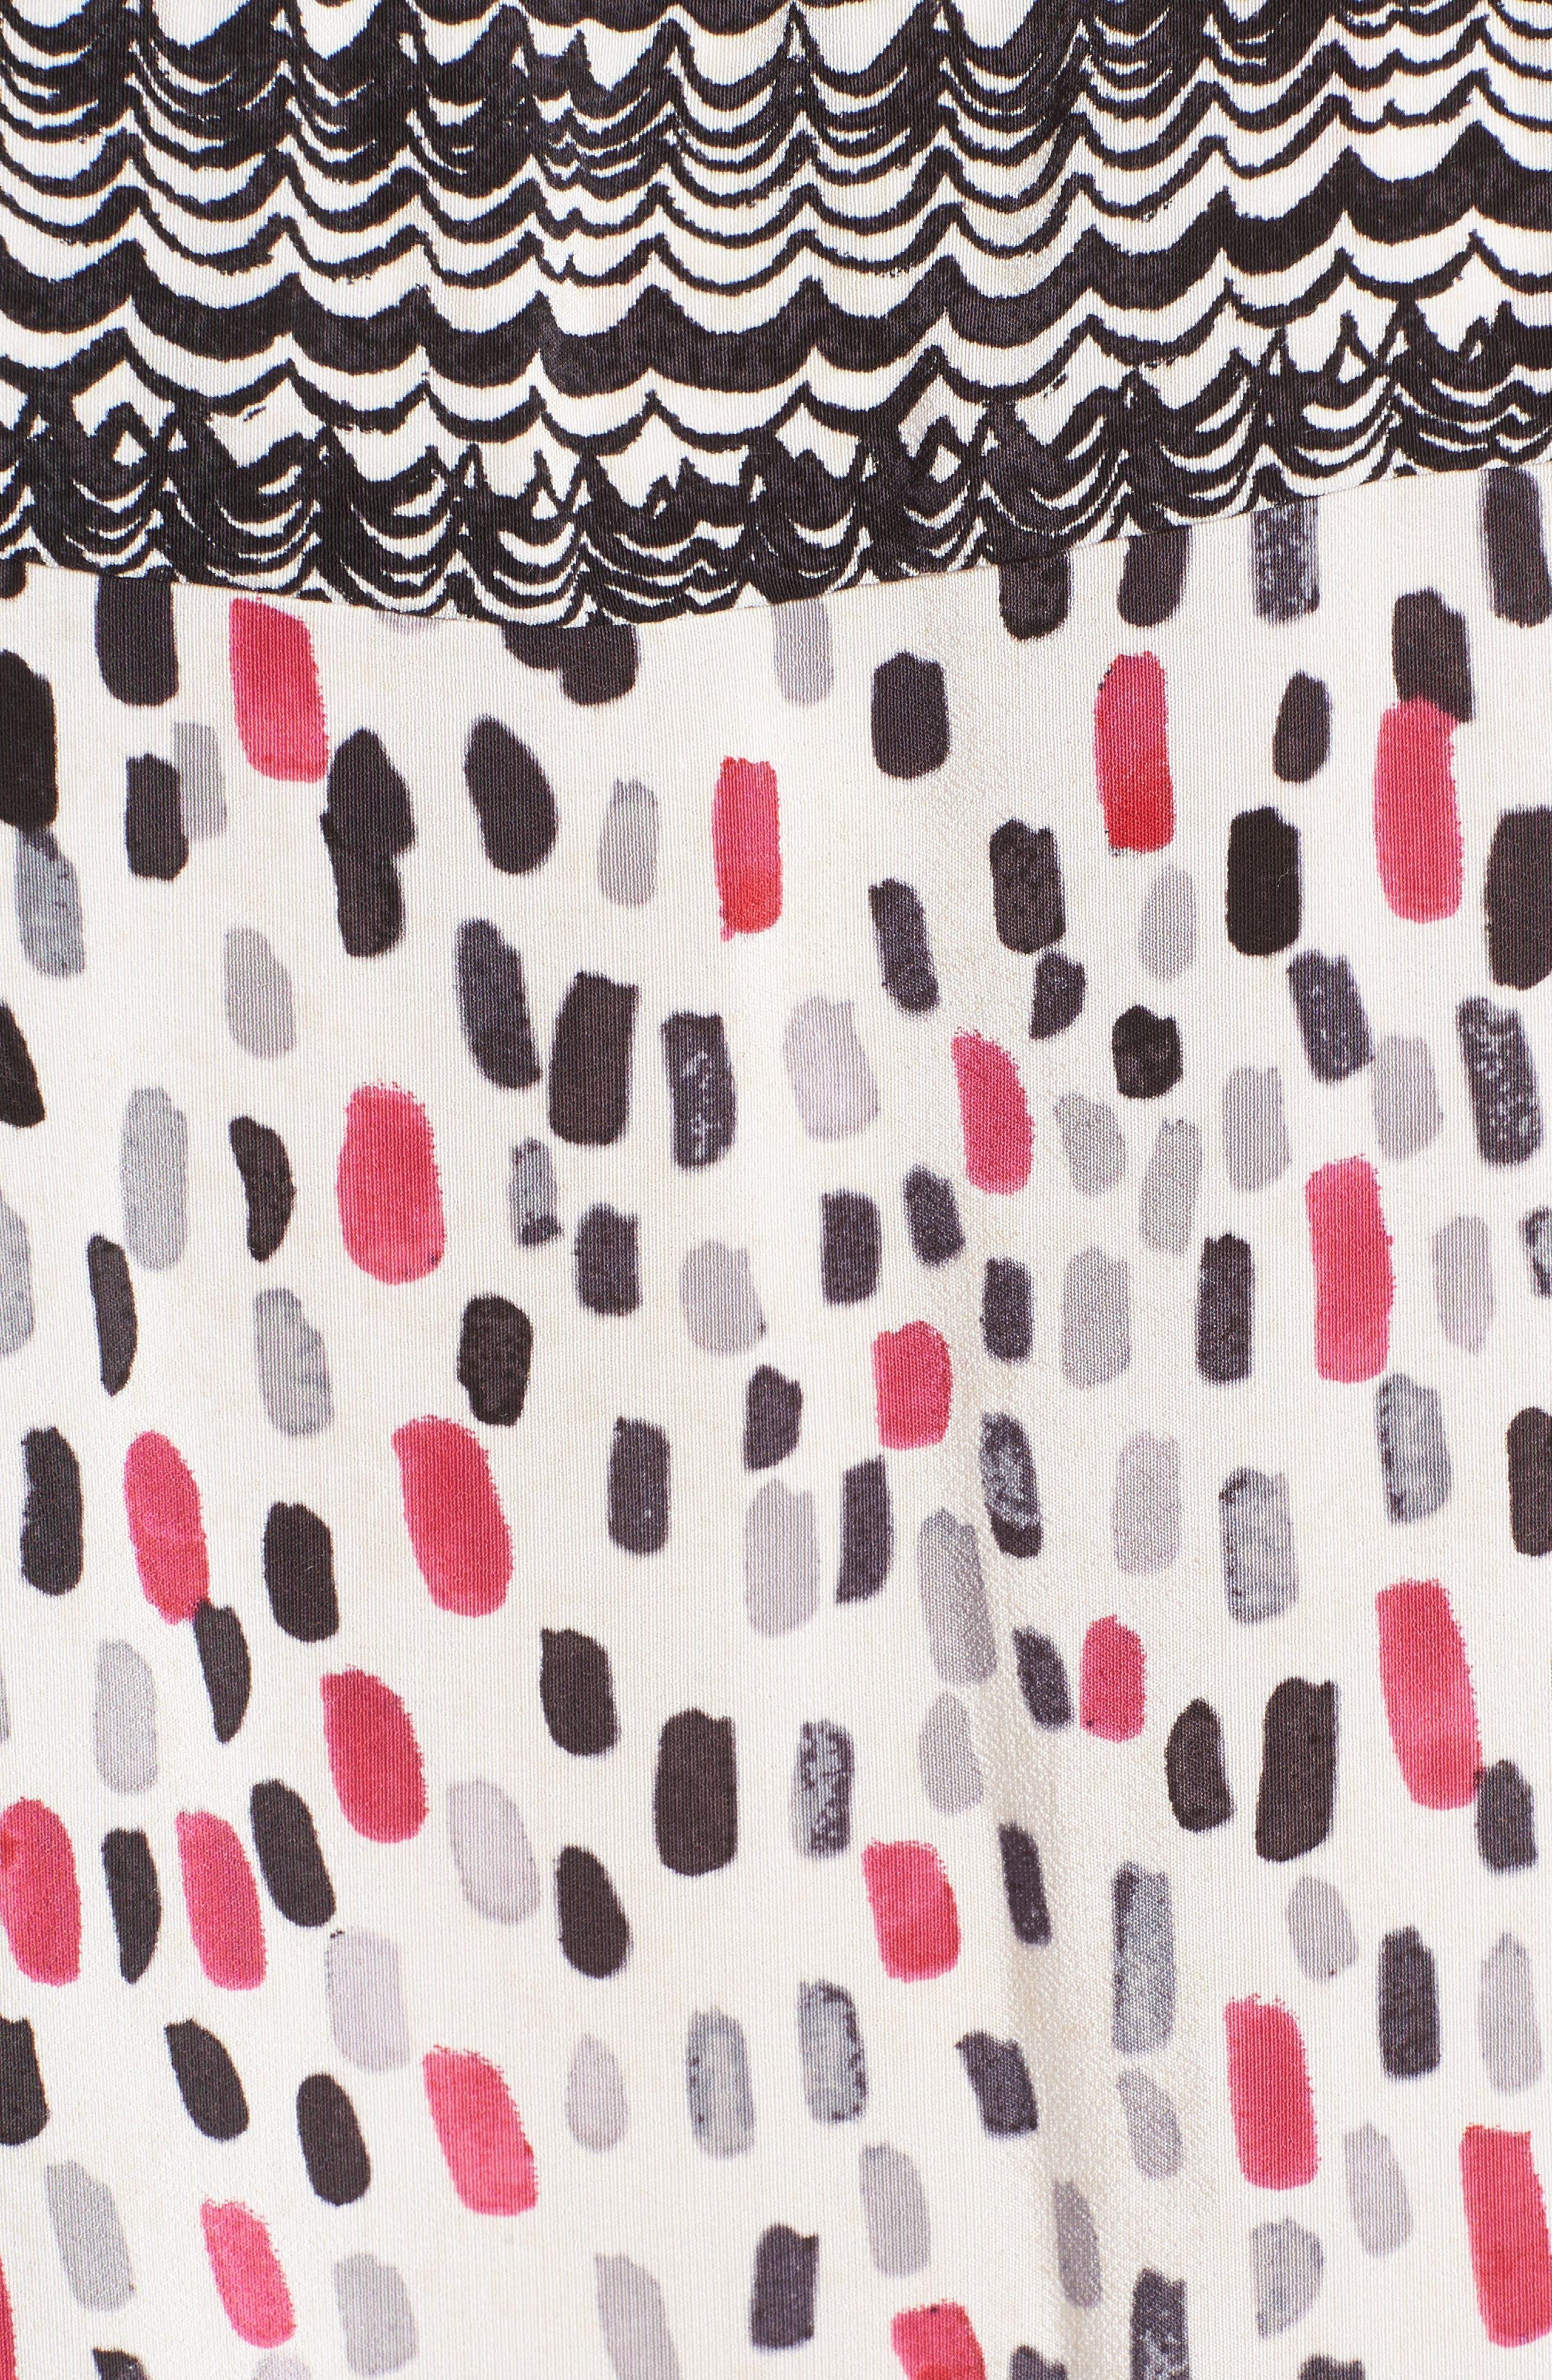 Confetti Tank Top,                             Alternate thumbnail 5, color,                             690